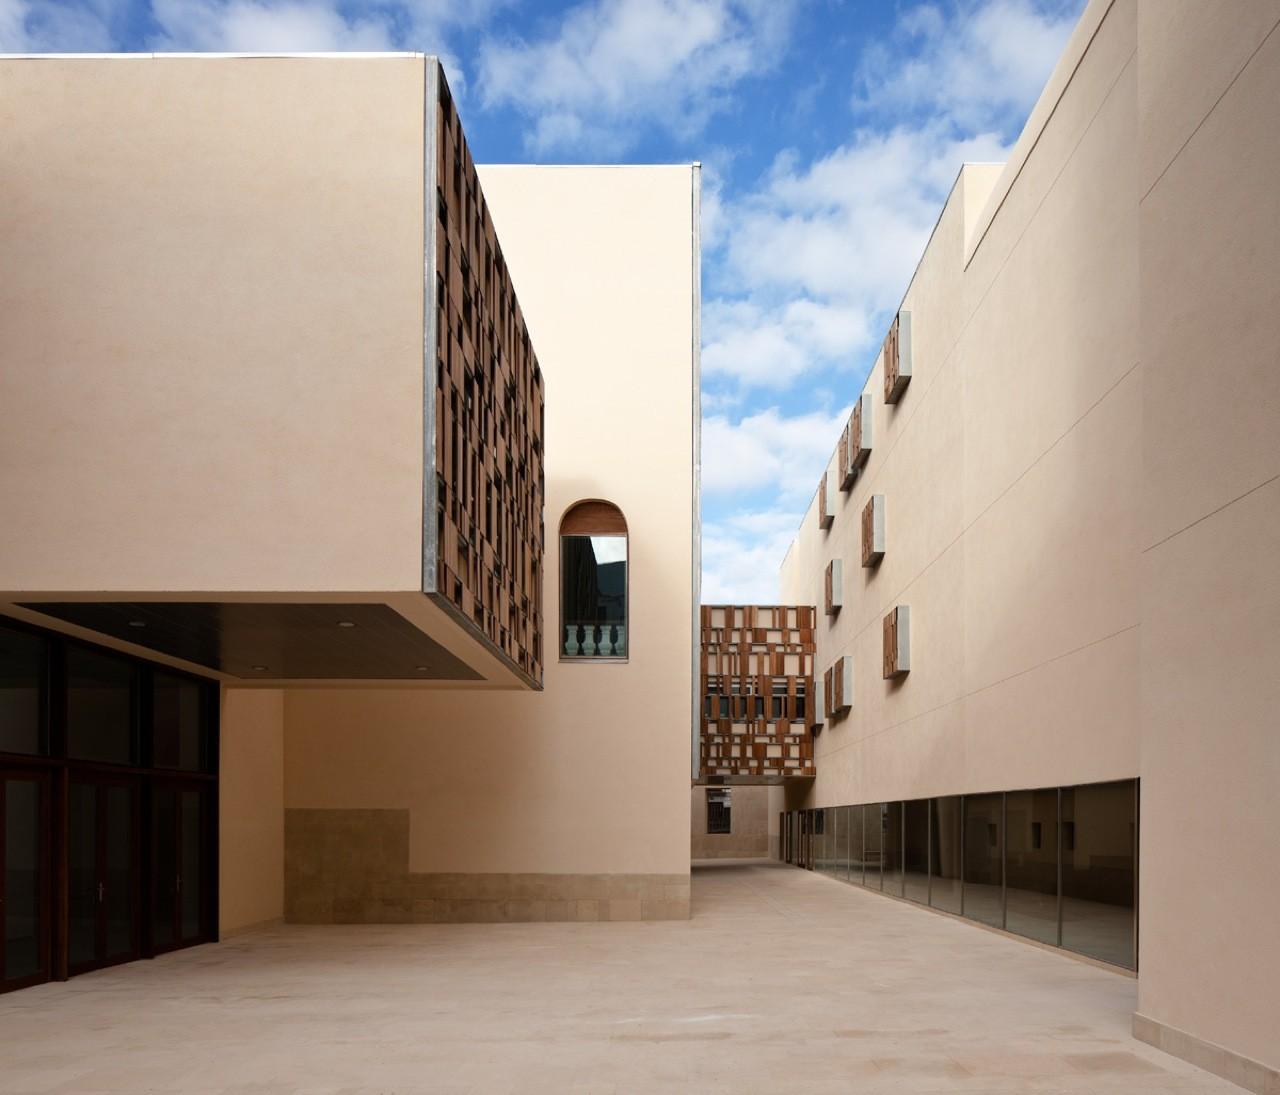 Renovation of the Baeza Town Hall / Viar Estudio Arquitectura, © Fernando Alda